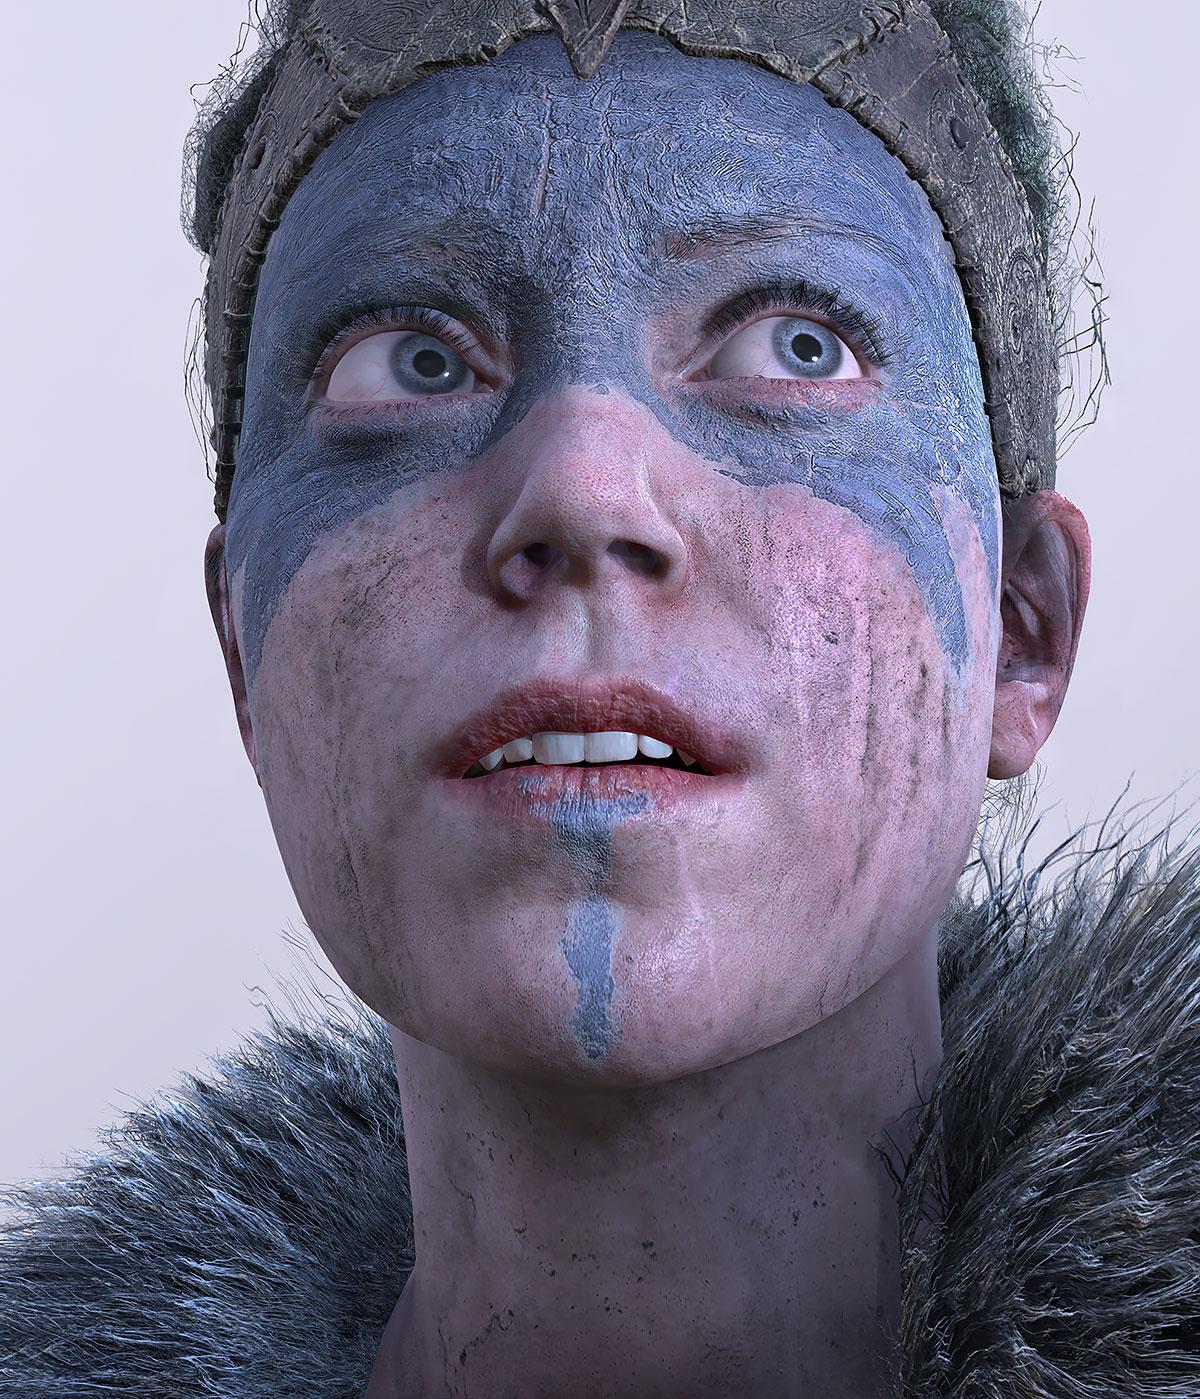 2018 Virtual In Game Face I 1200 - 2018 - Virtual In-Game Face. I